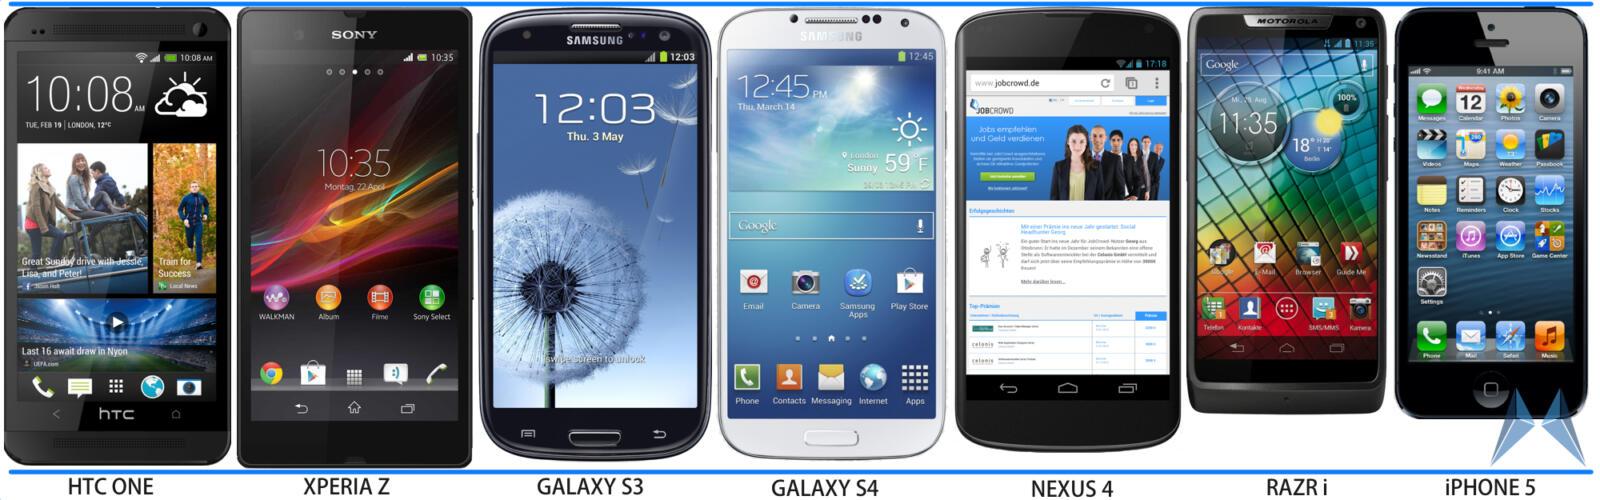 Android HTC Motorola Samsung